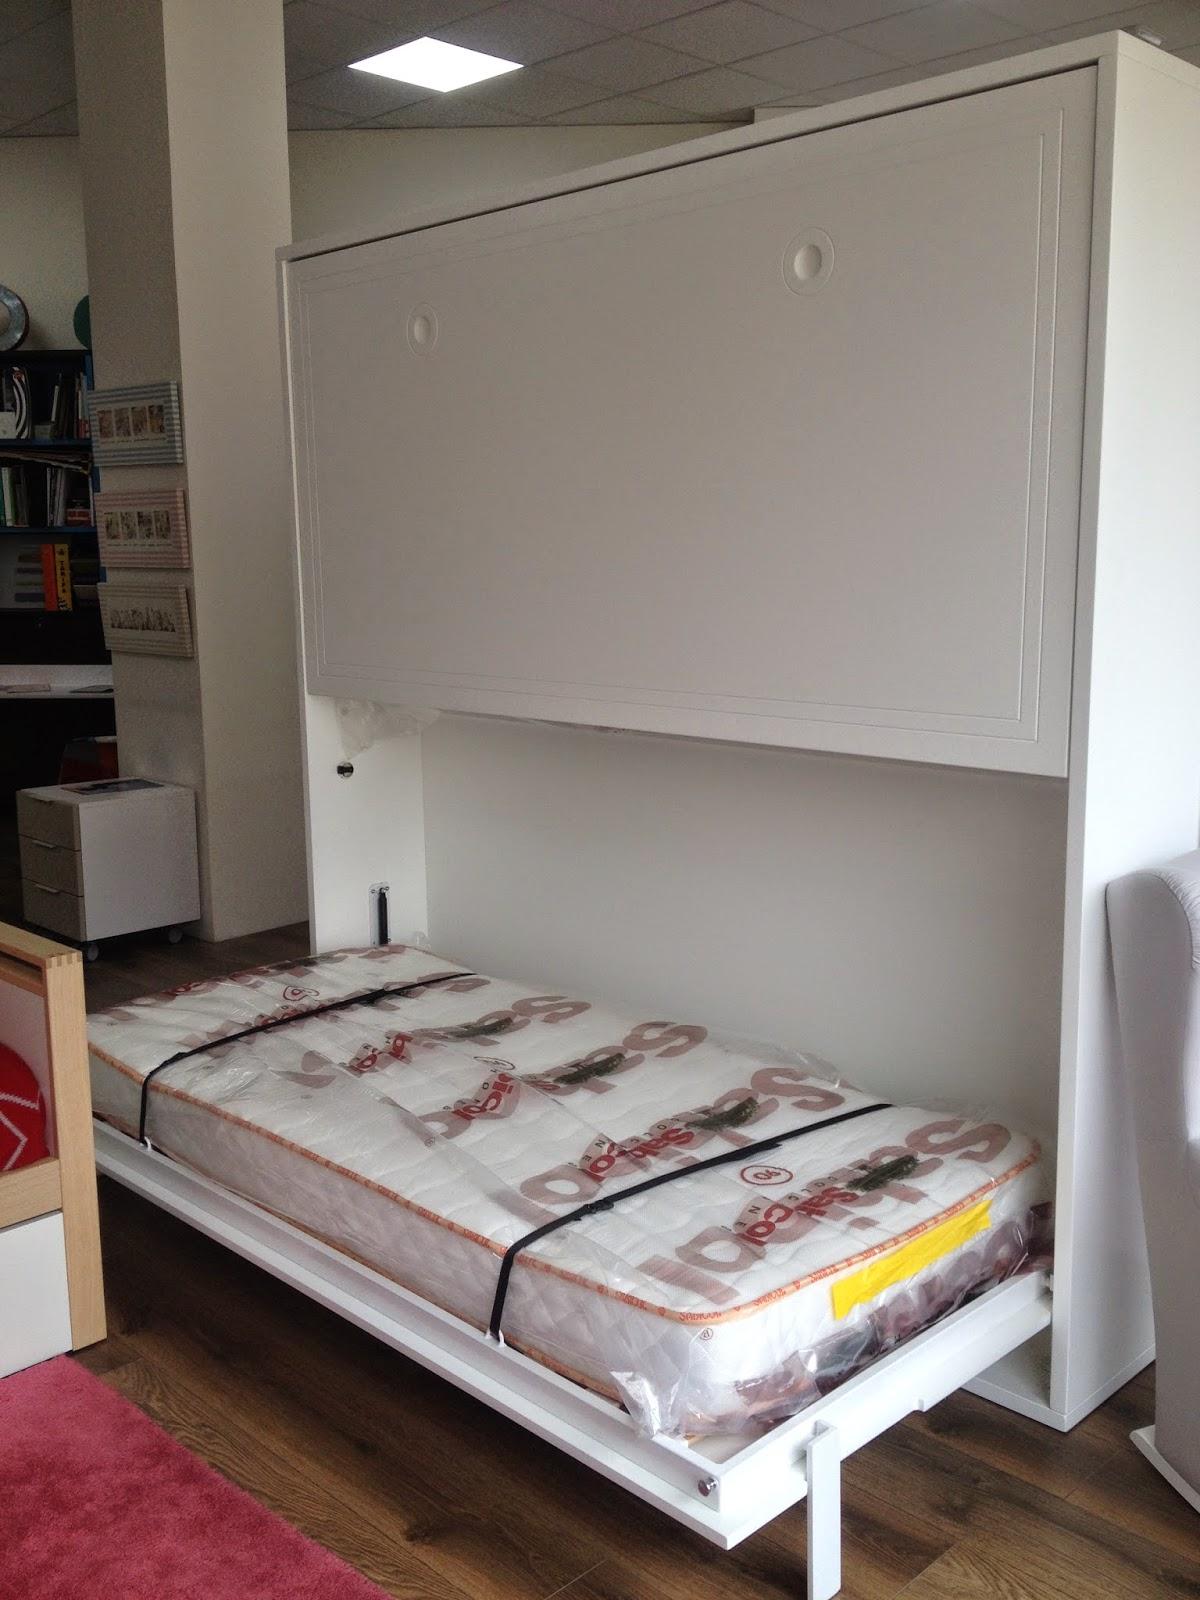 911738824 for Muebles de oficina zona norte